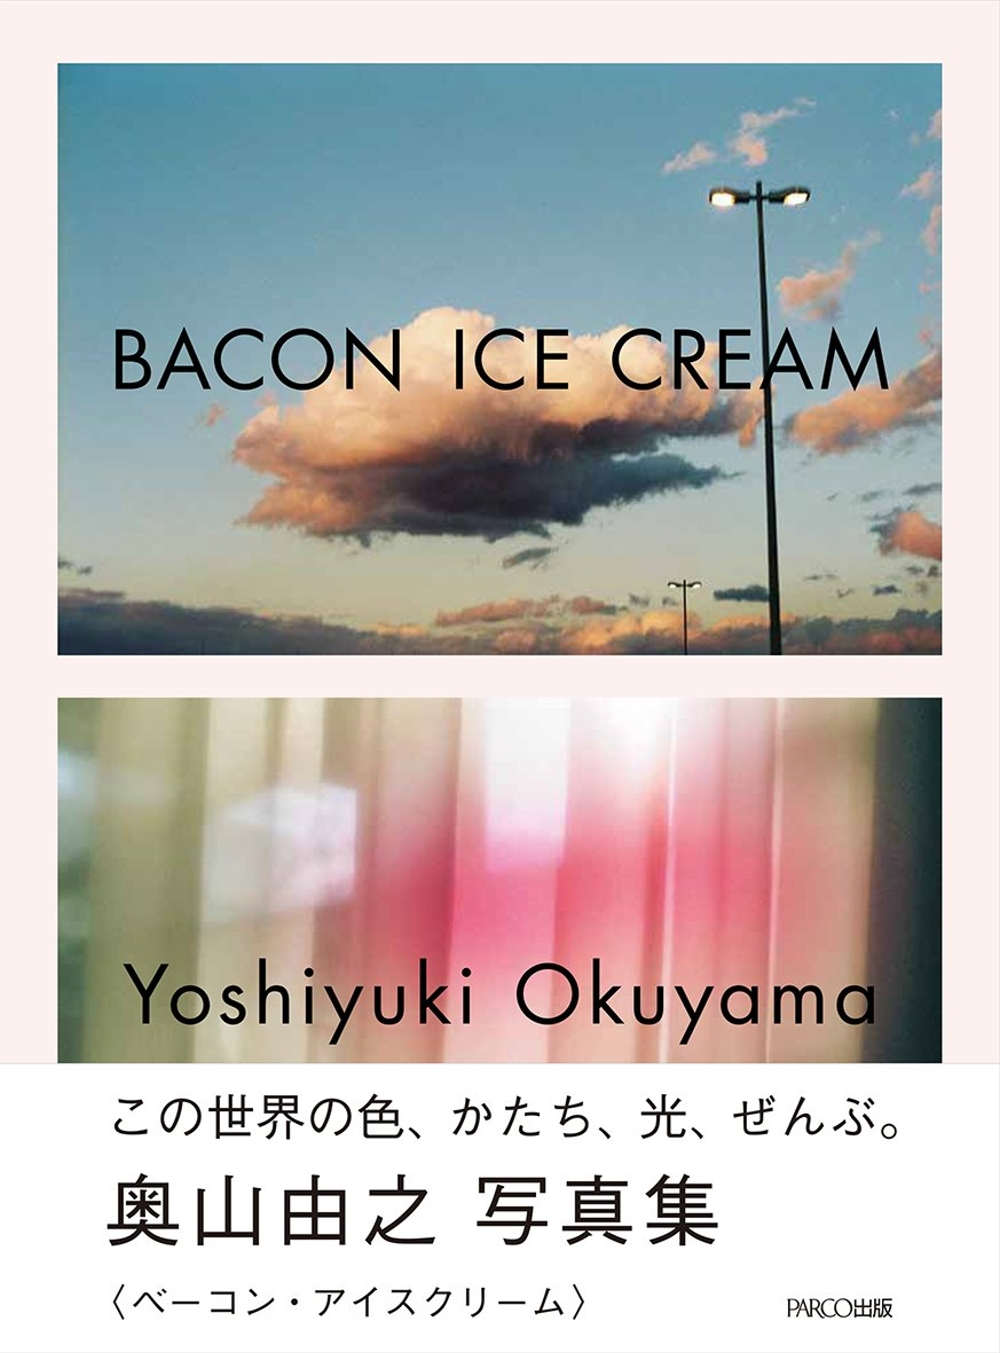 奥山由之攝影集:BACON ICE CREAM